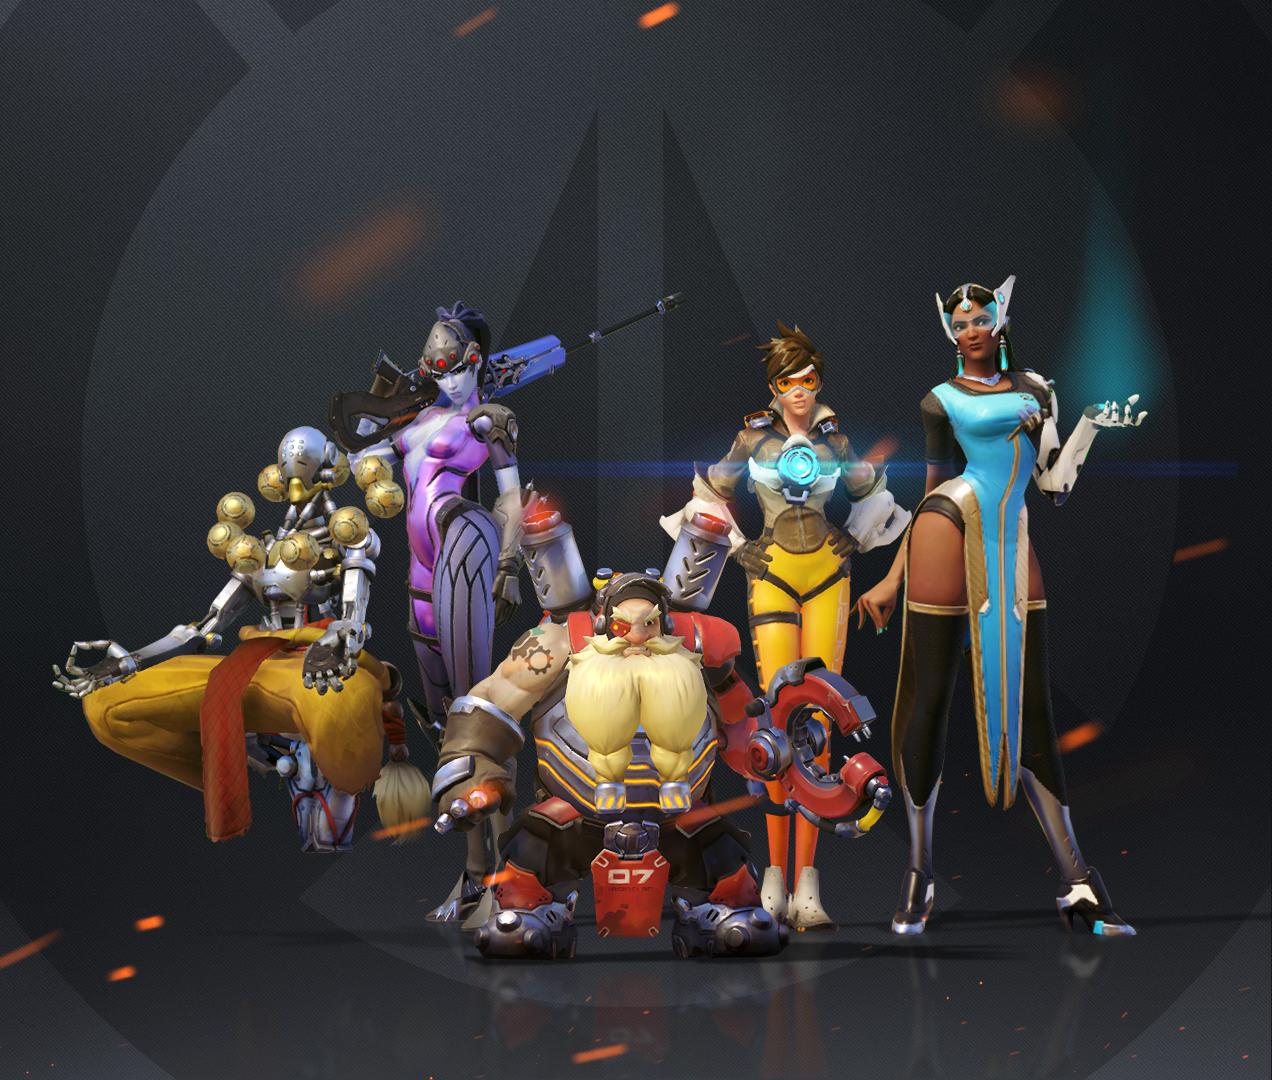 Overwatch - Group shot by Guntharf